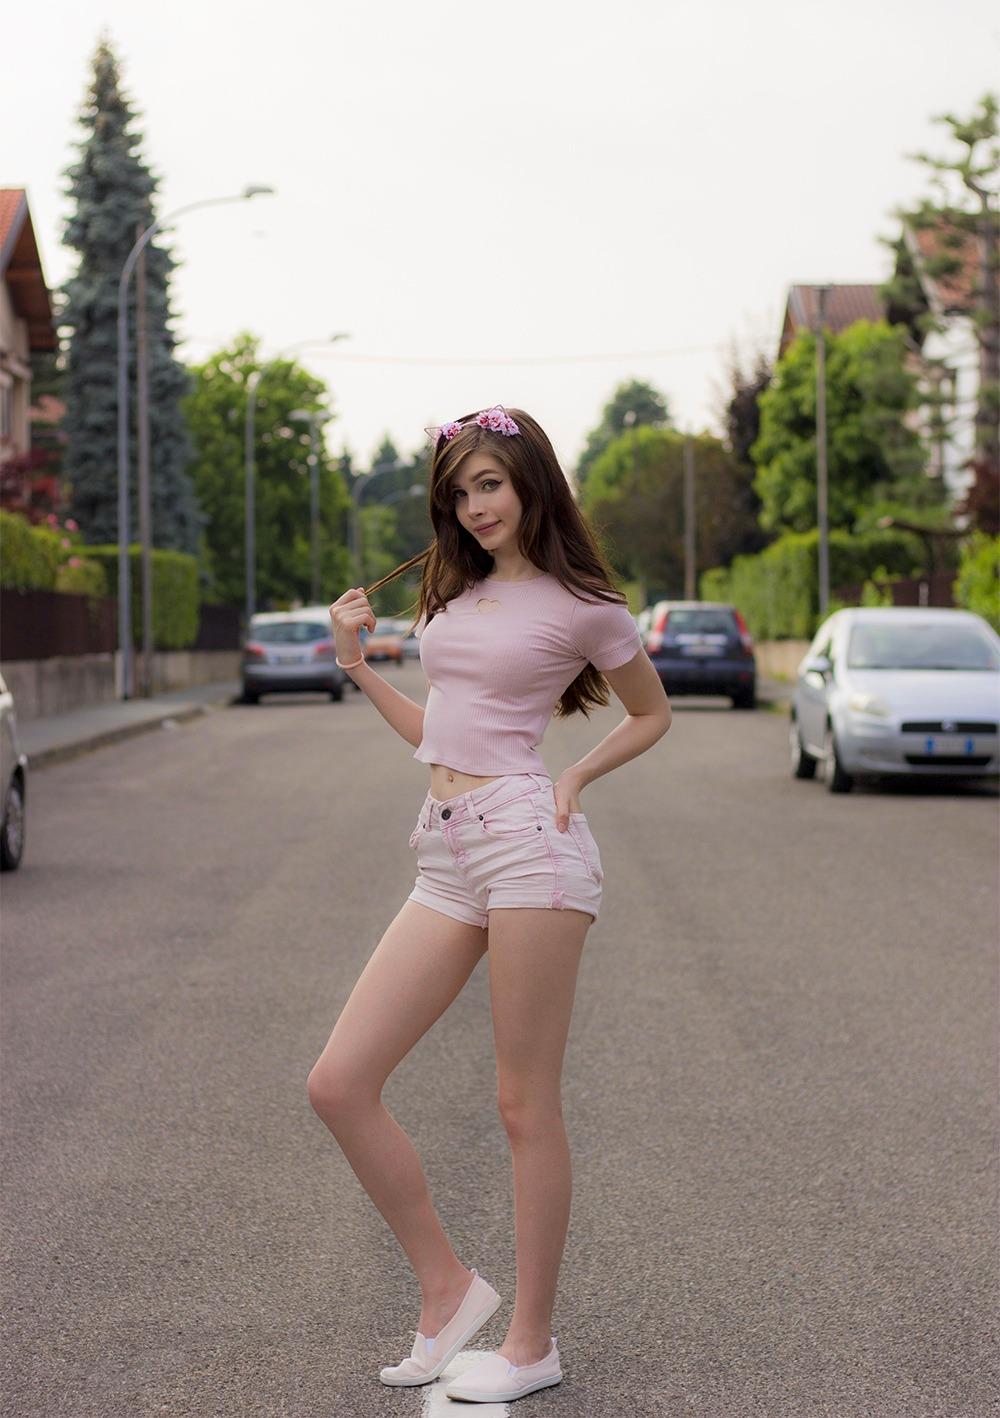 Karina Kozyreva nudes (57 pics), hacked Sexy, YouTube, panties 2017